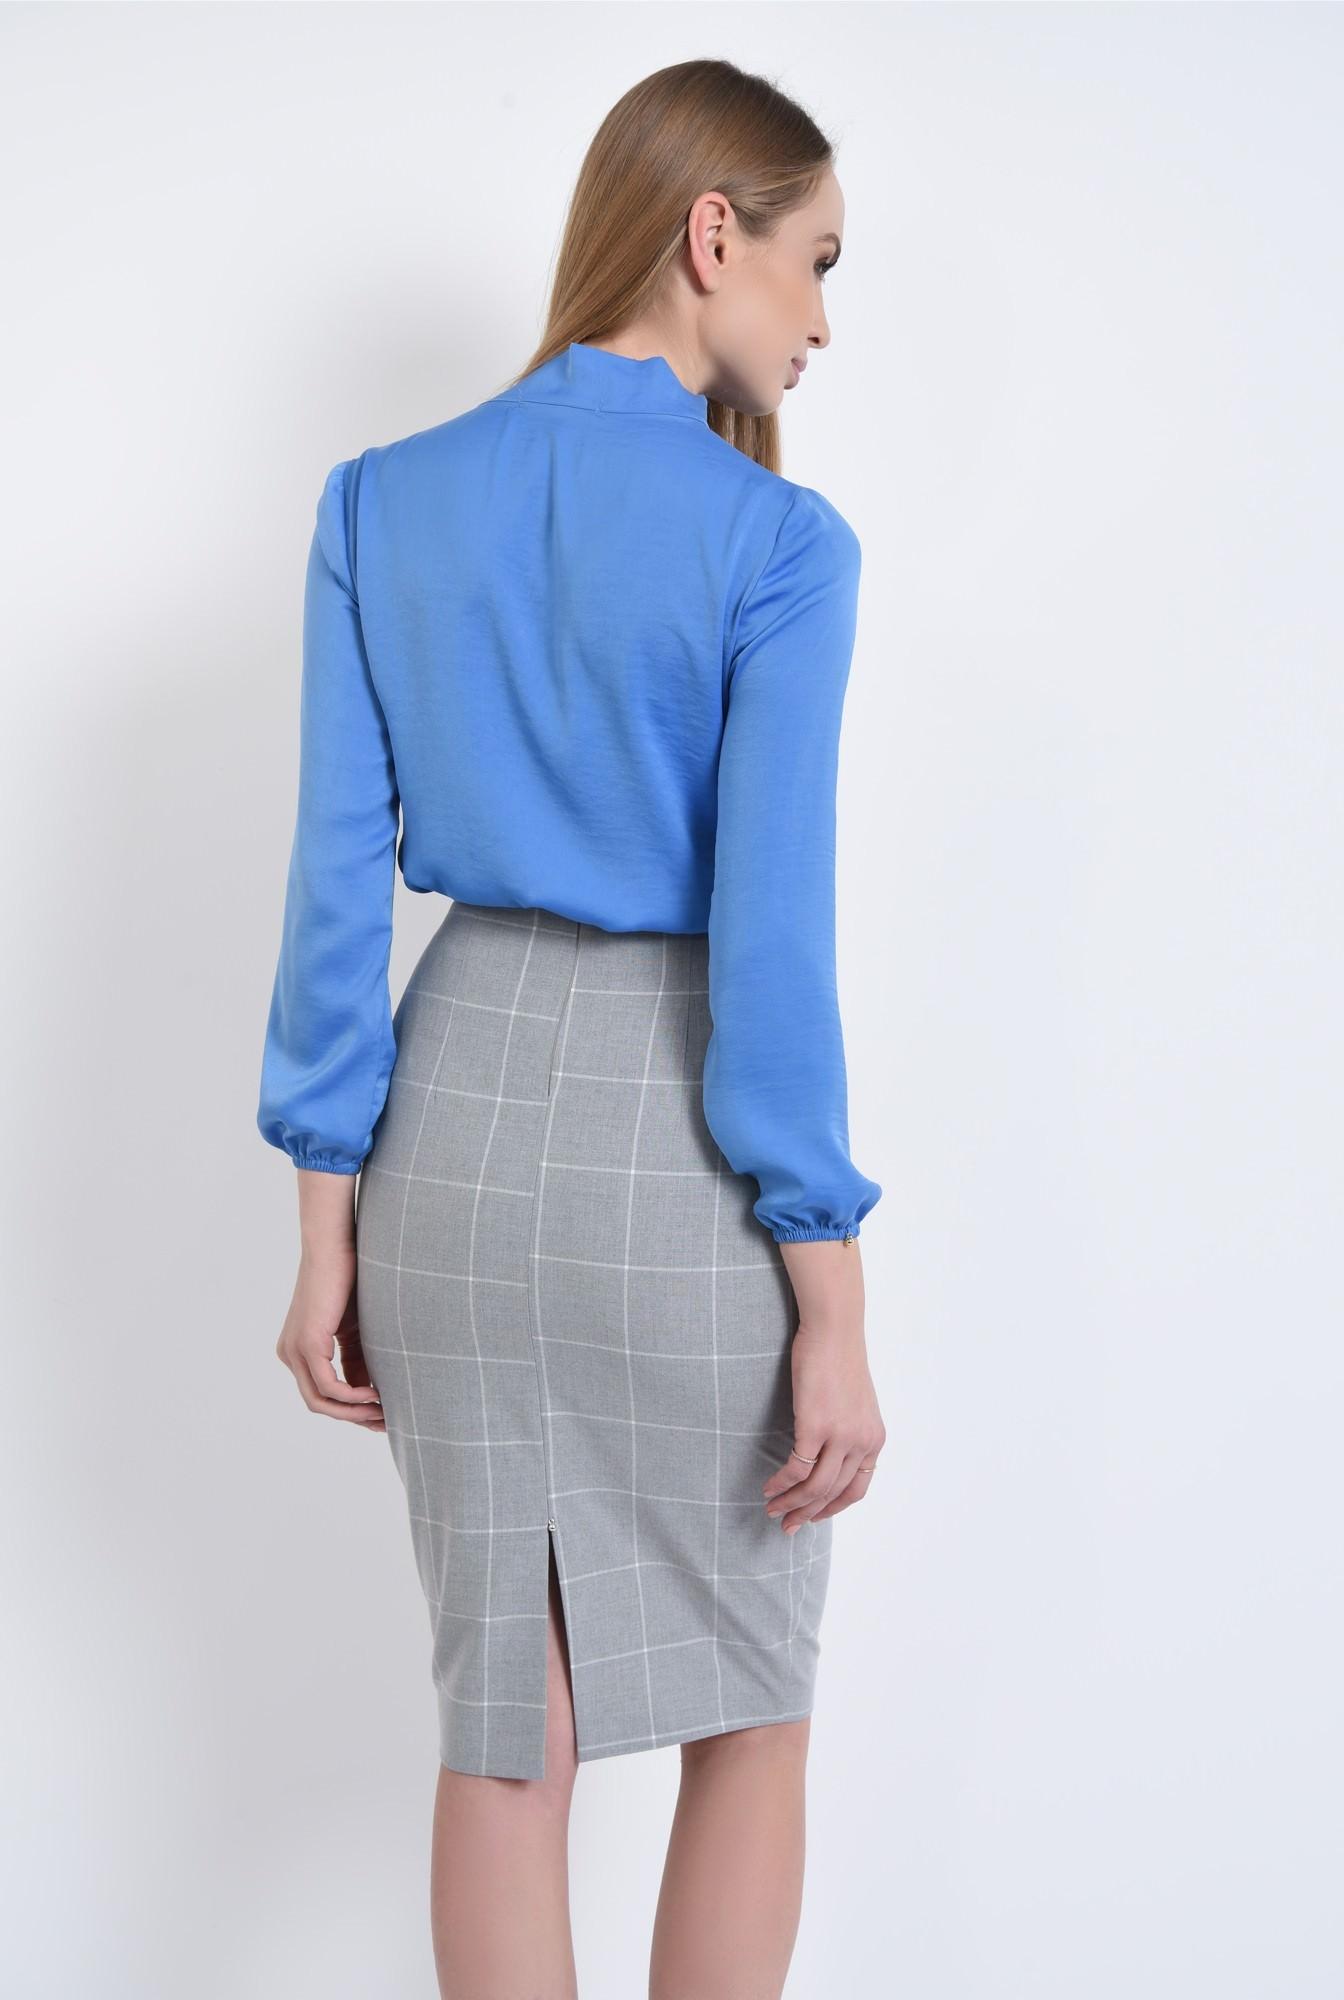 1 - bluza office, bleu, satinata, maneci lungi